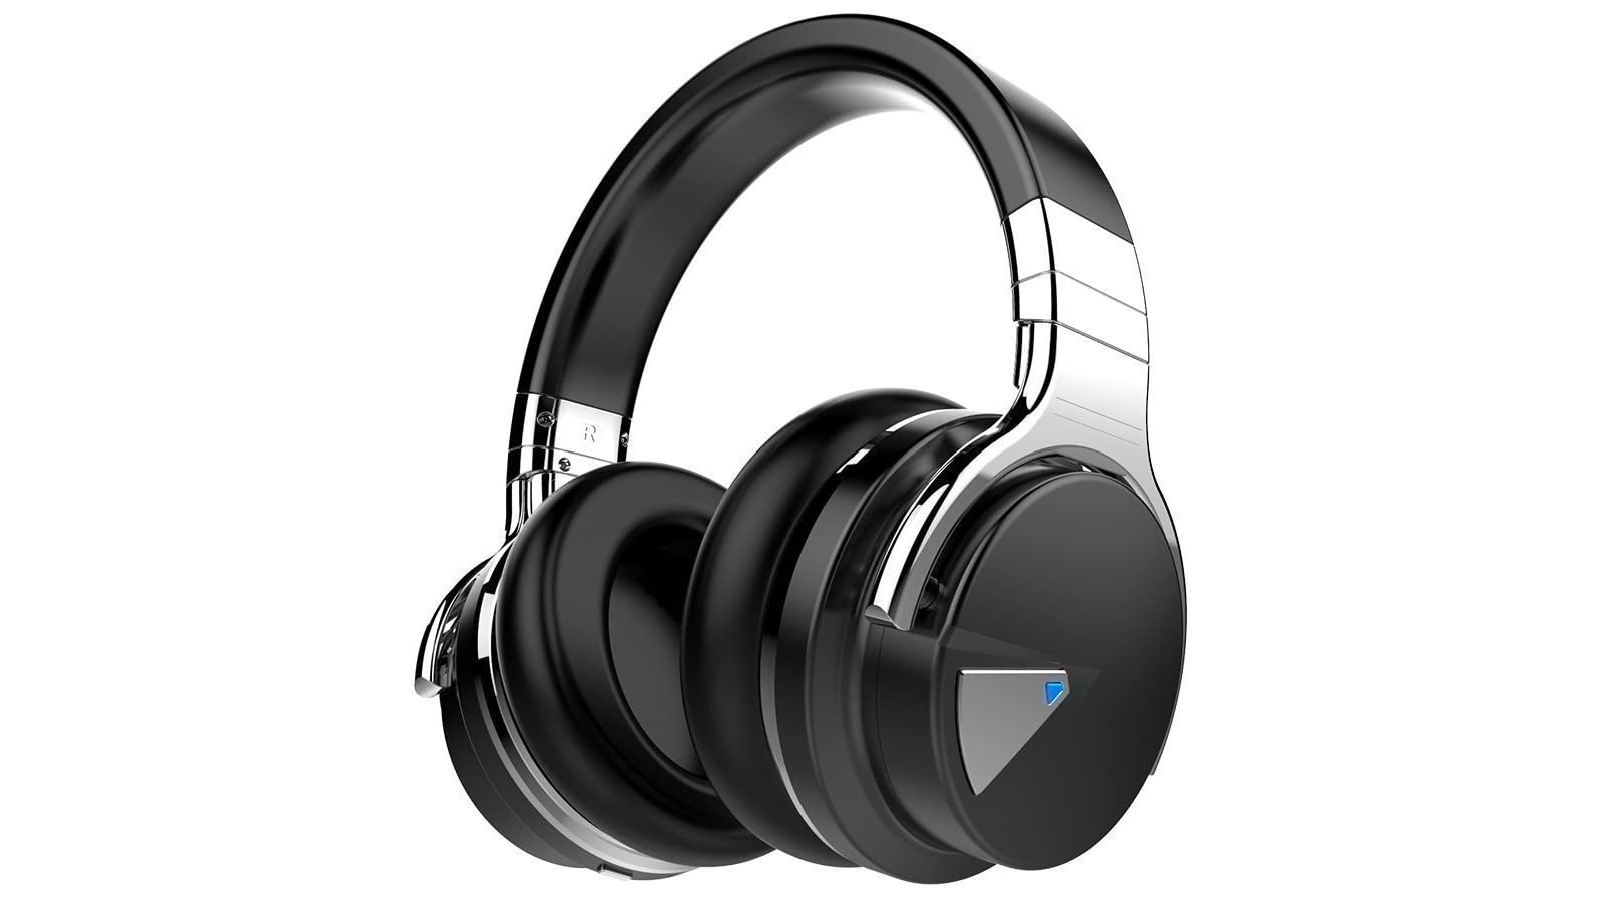 Cowin E7 Noise-Cancelling Headphones